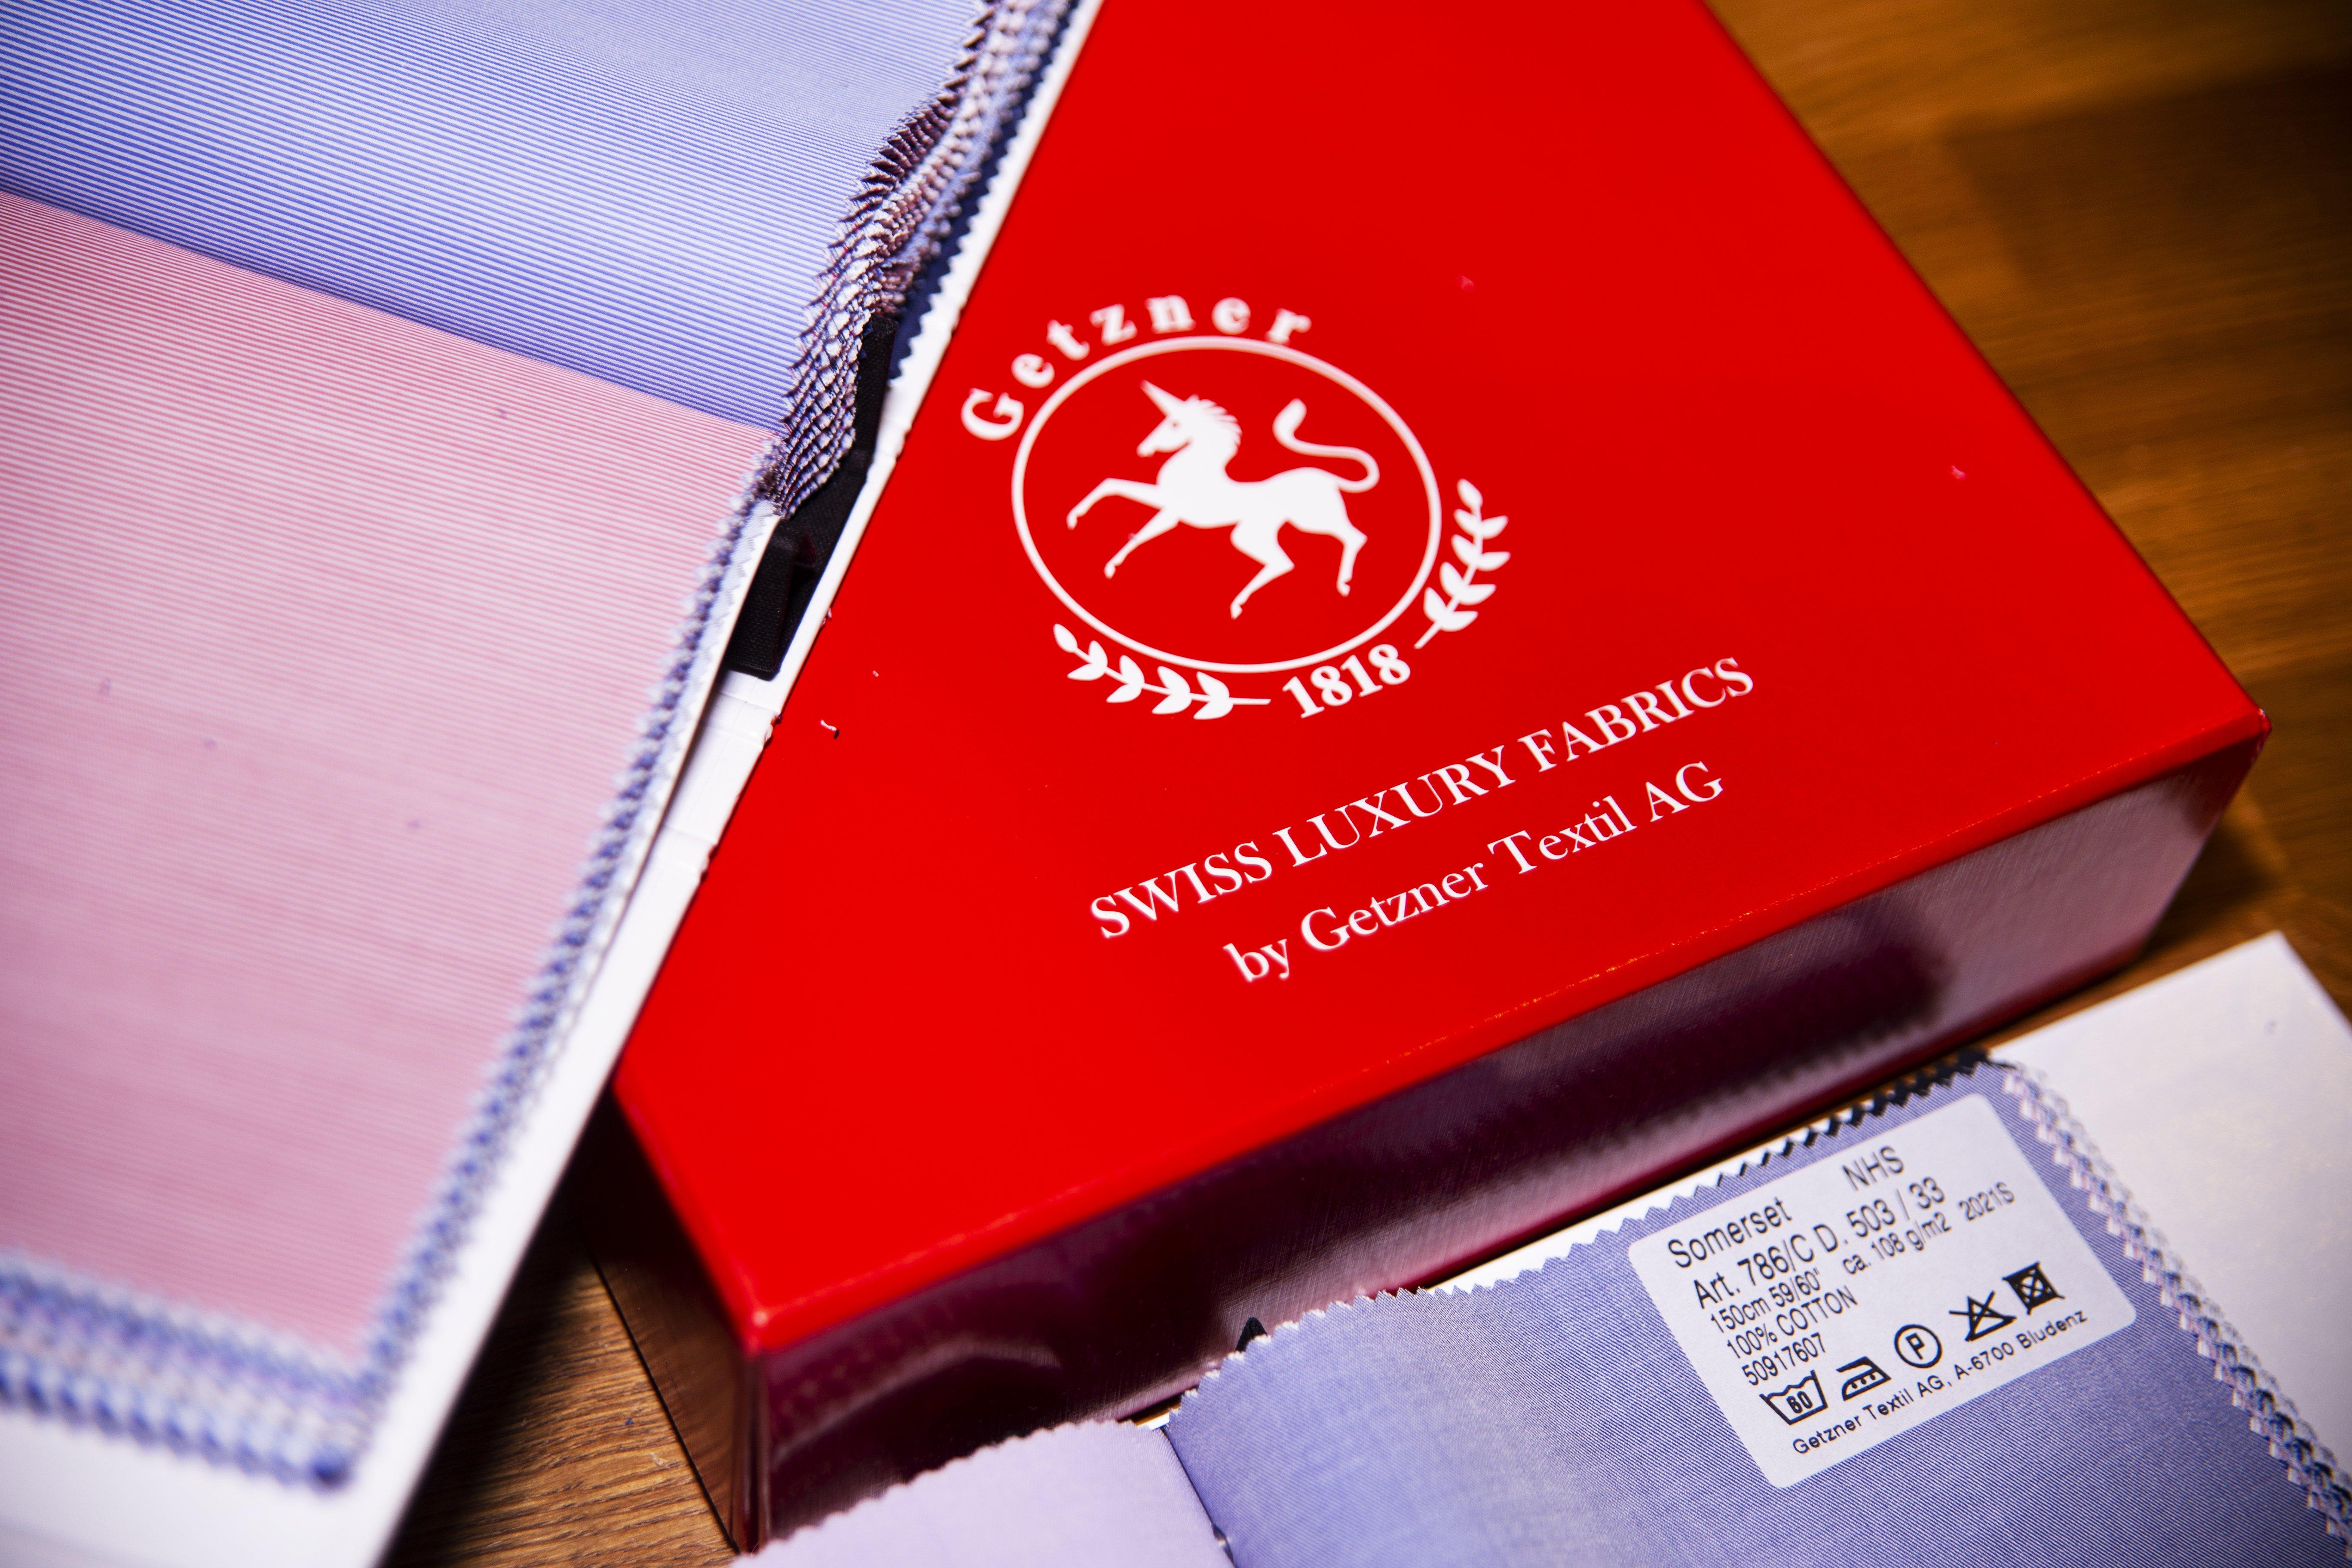 Nowe katalogi z tkaninami!